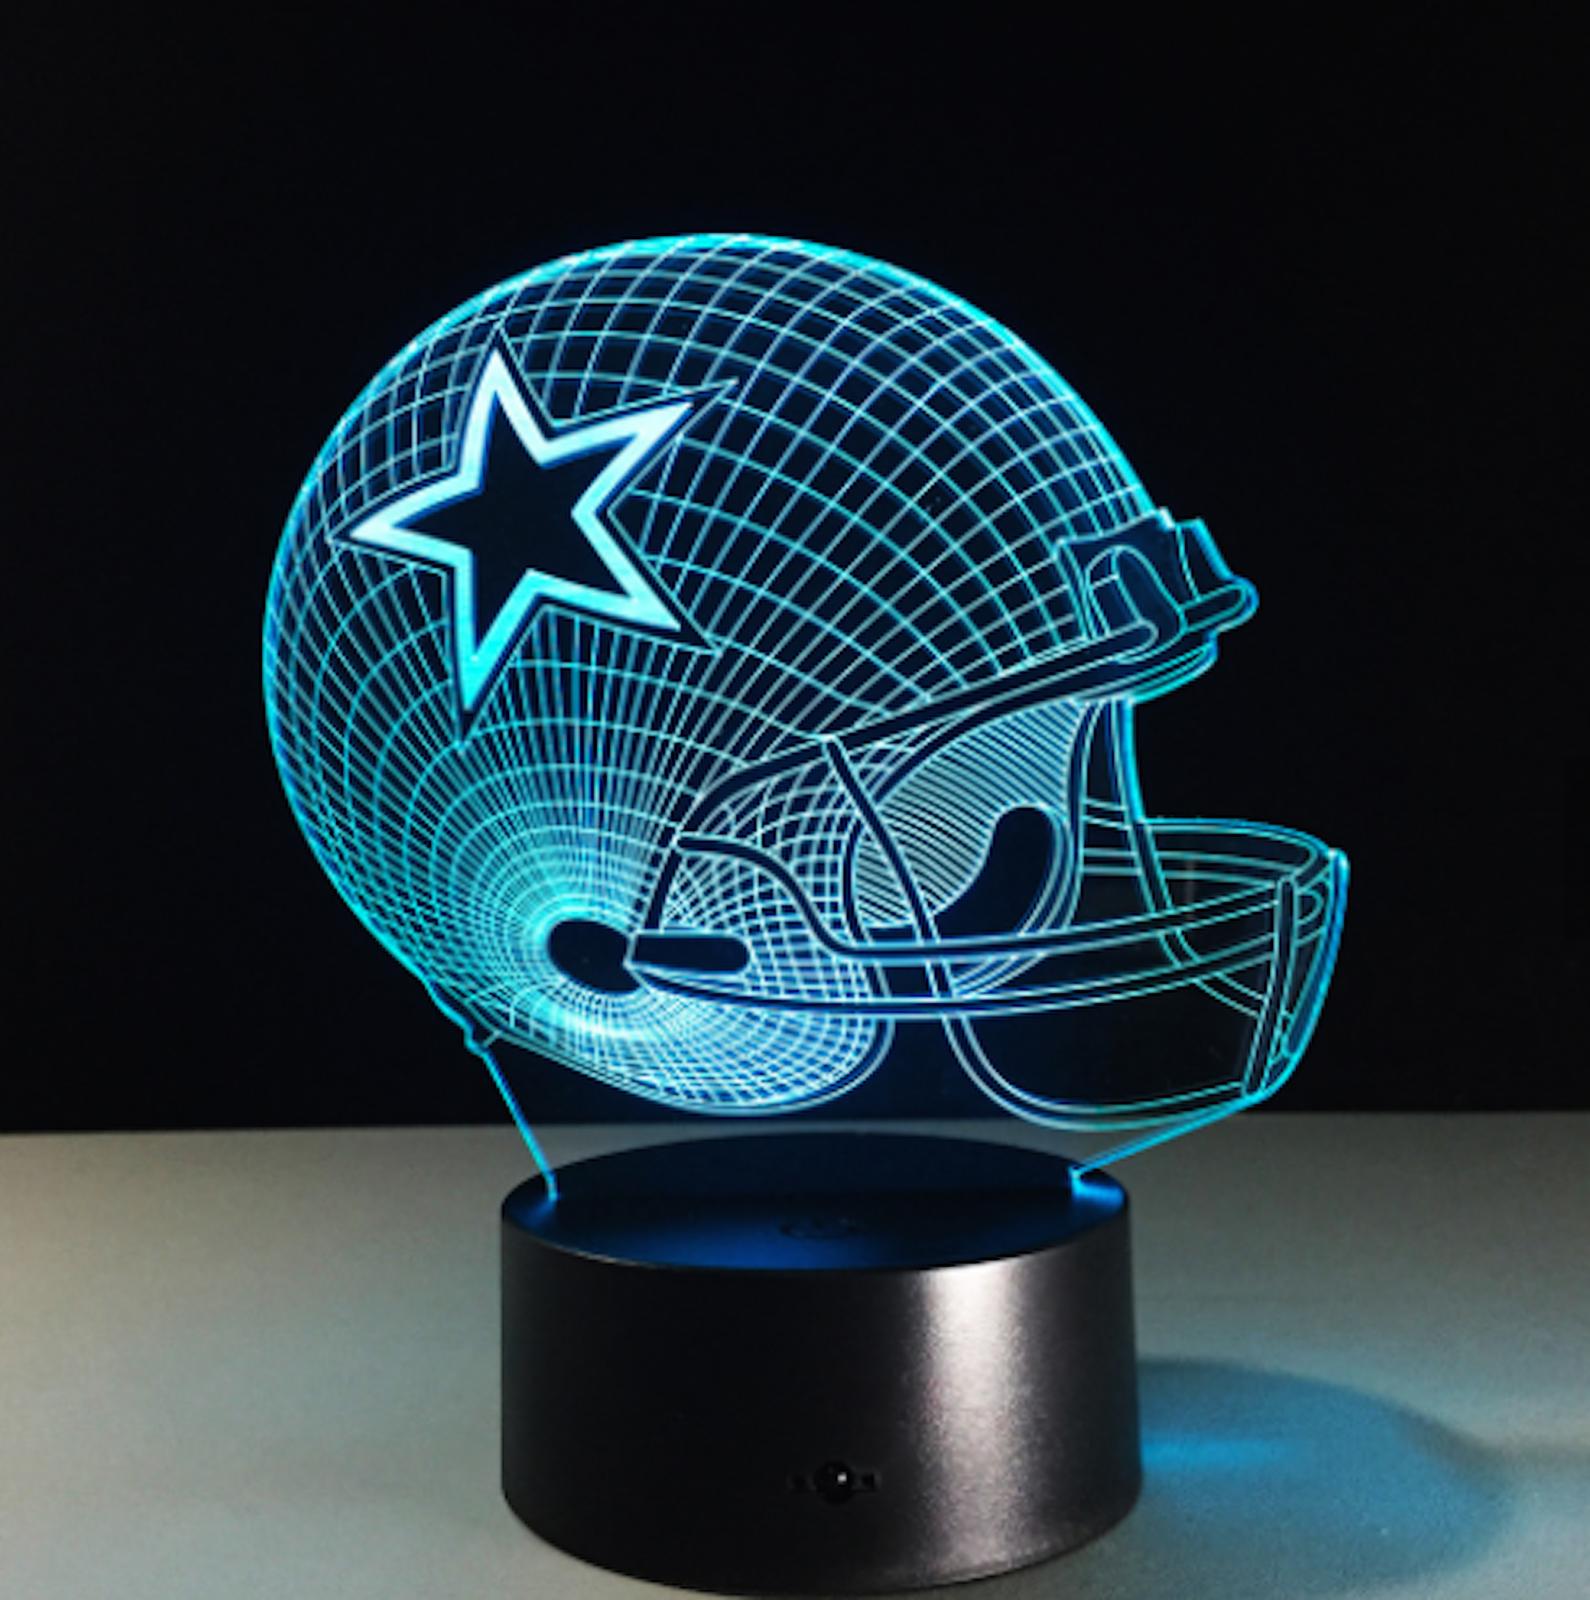 Dallas Cowboys Collectible NFL Decor Night Light Touch Lamp Gift- Men,Kids,Women